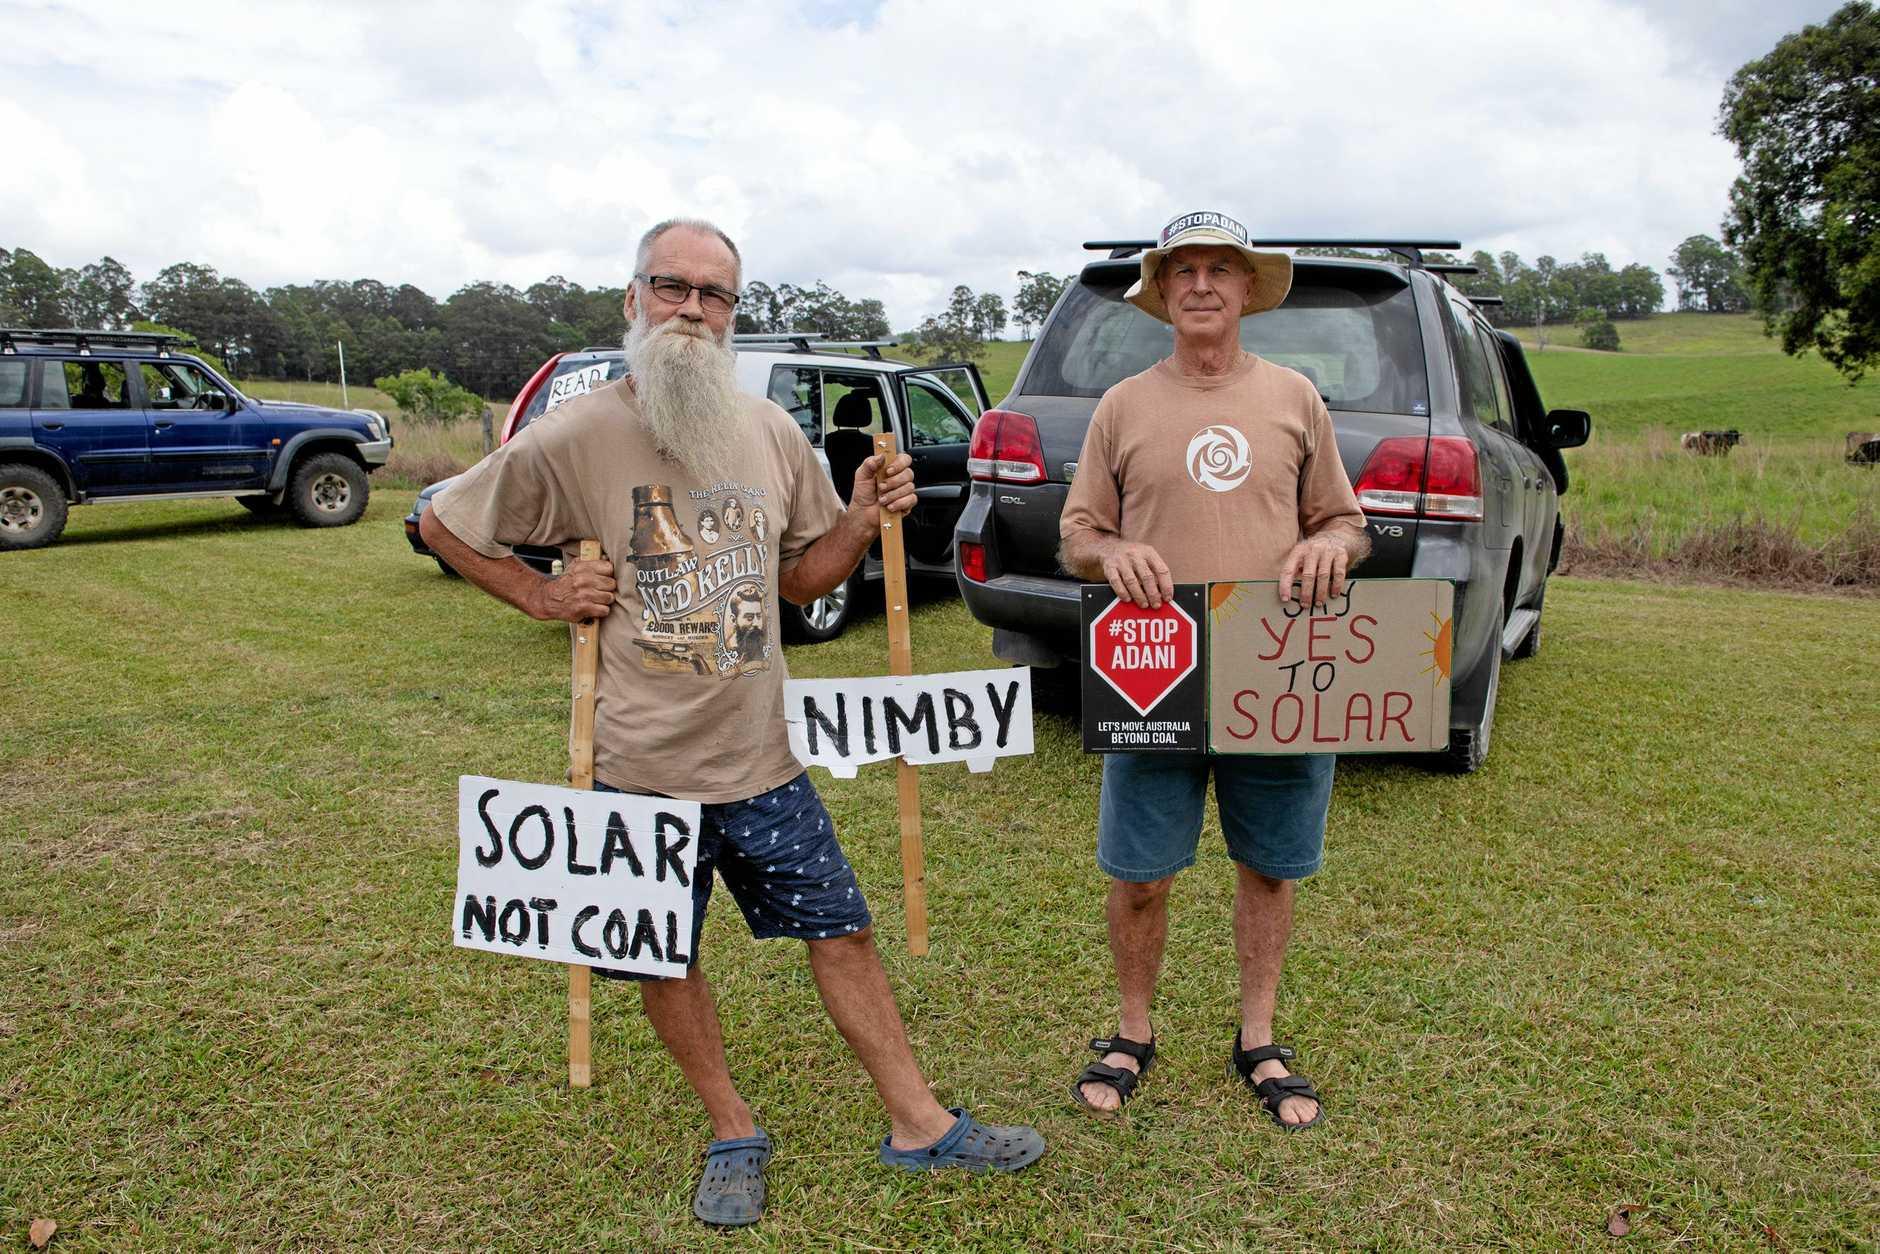 Solar Farm protest nana glenn.07 JAN 2019